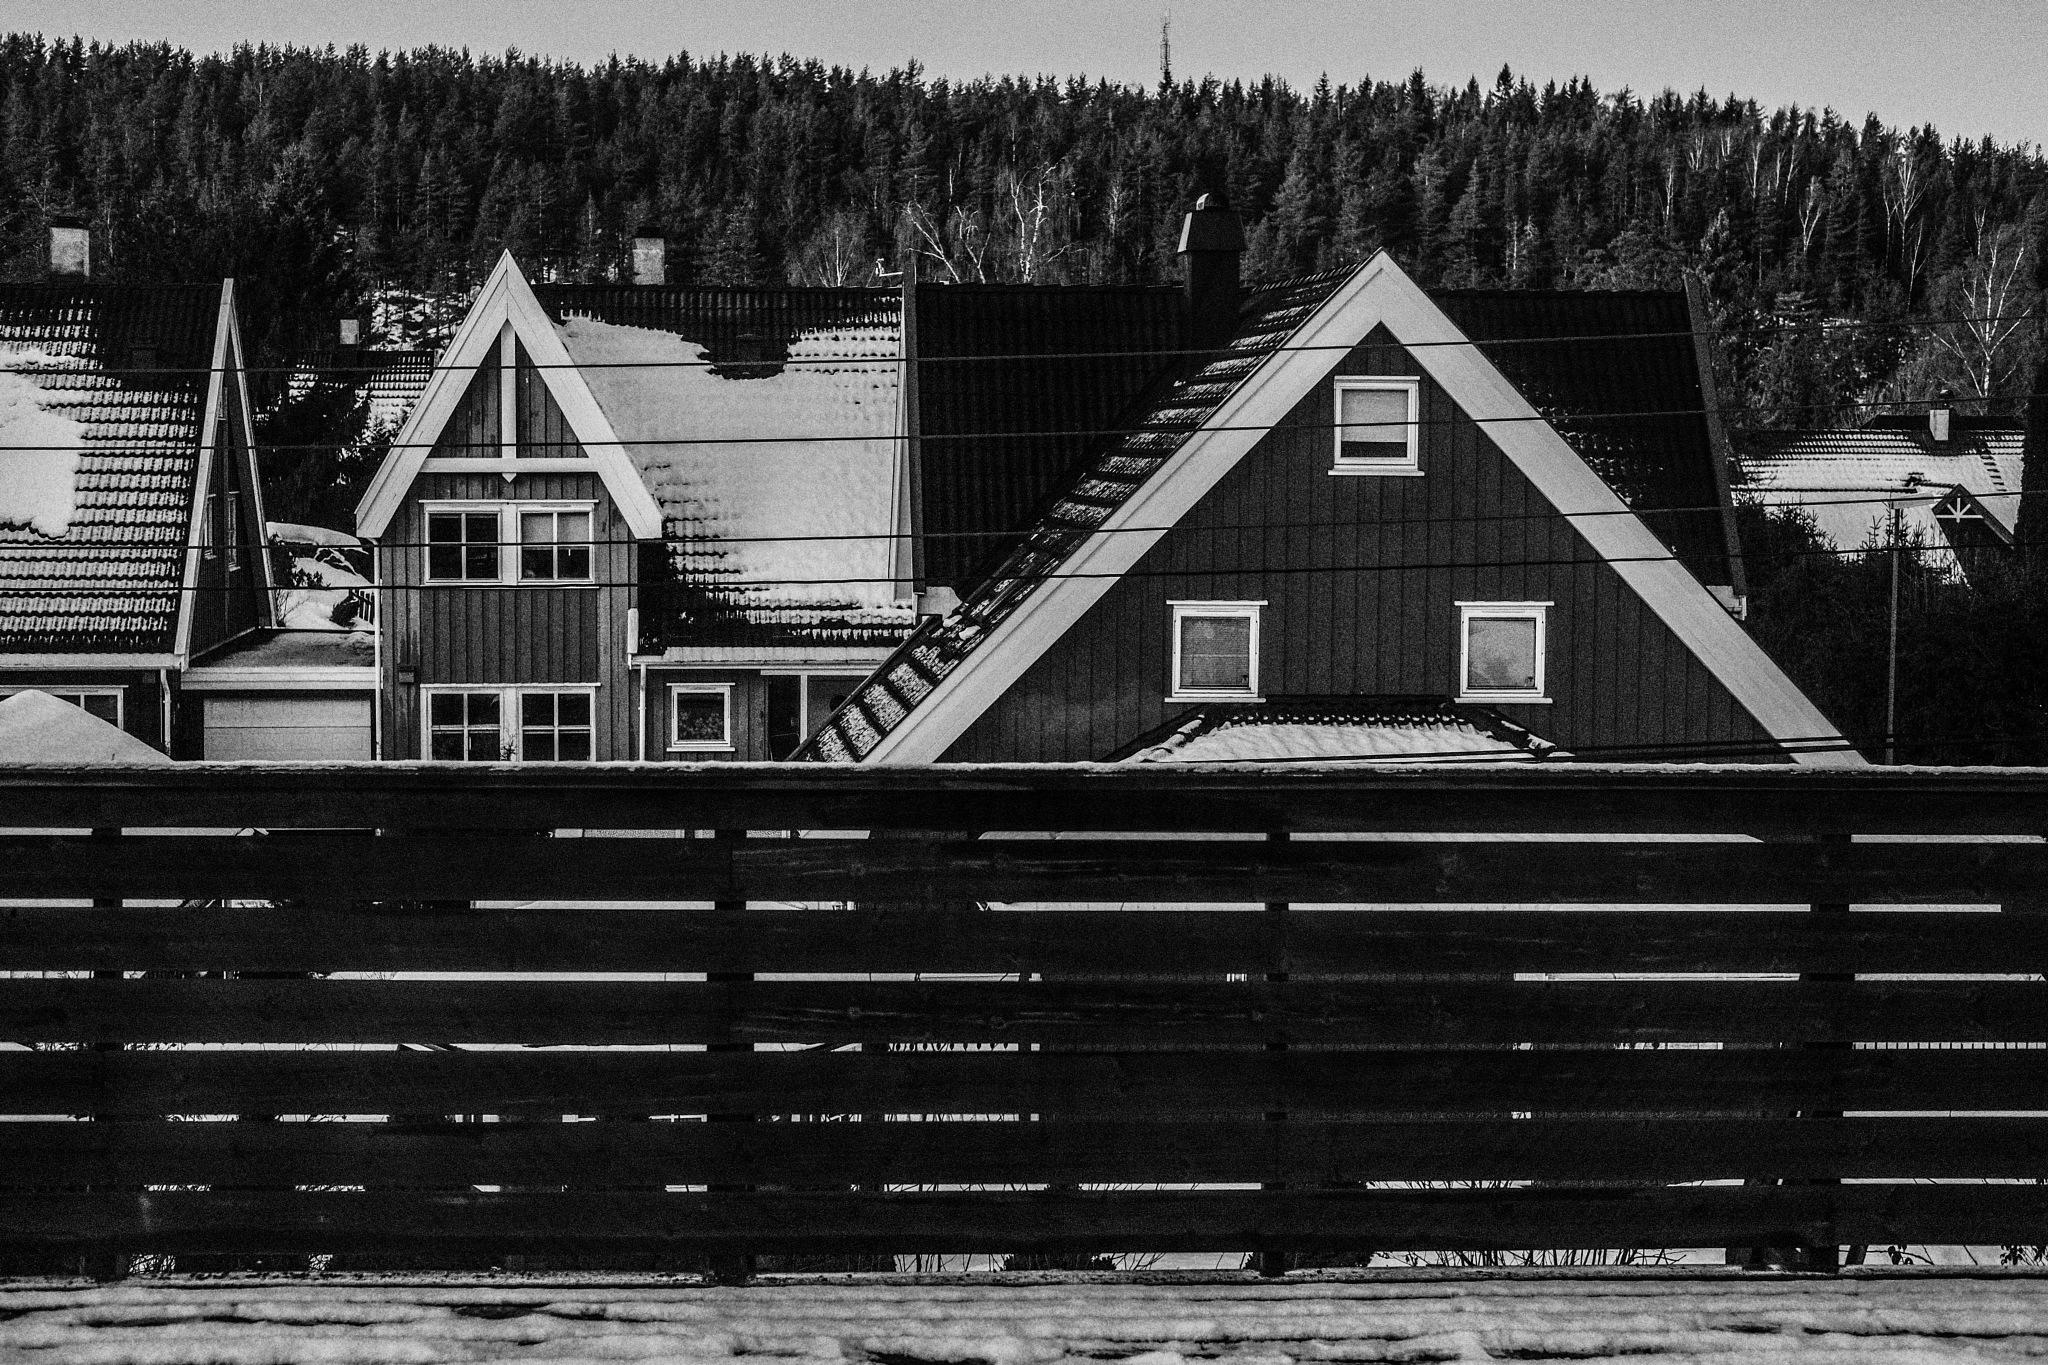 Roofs of The North  by Goran Jorganovich